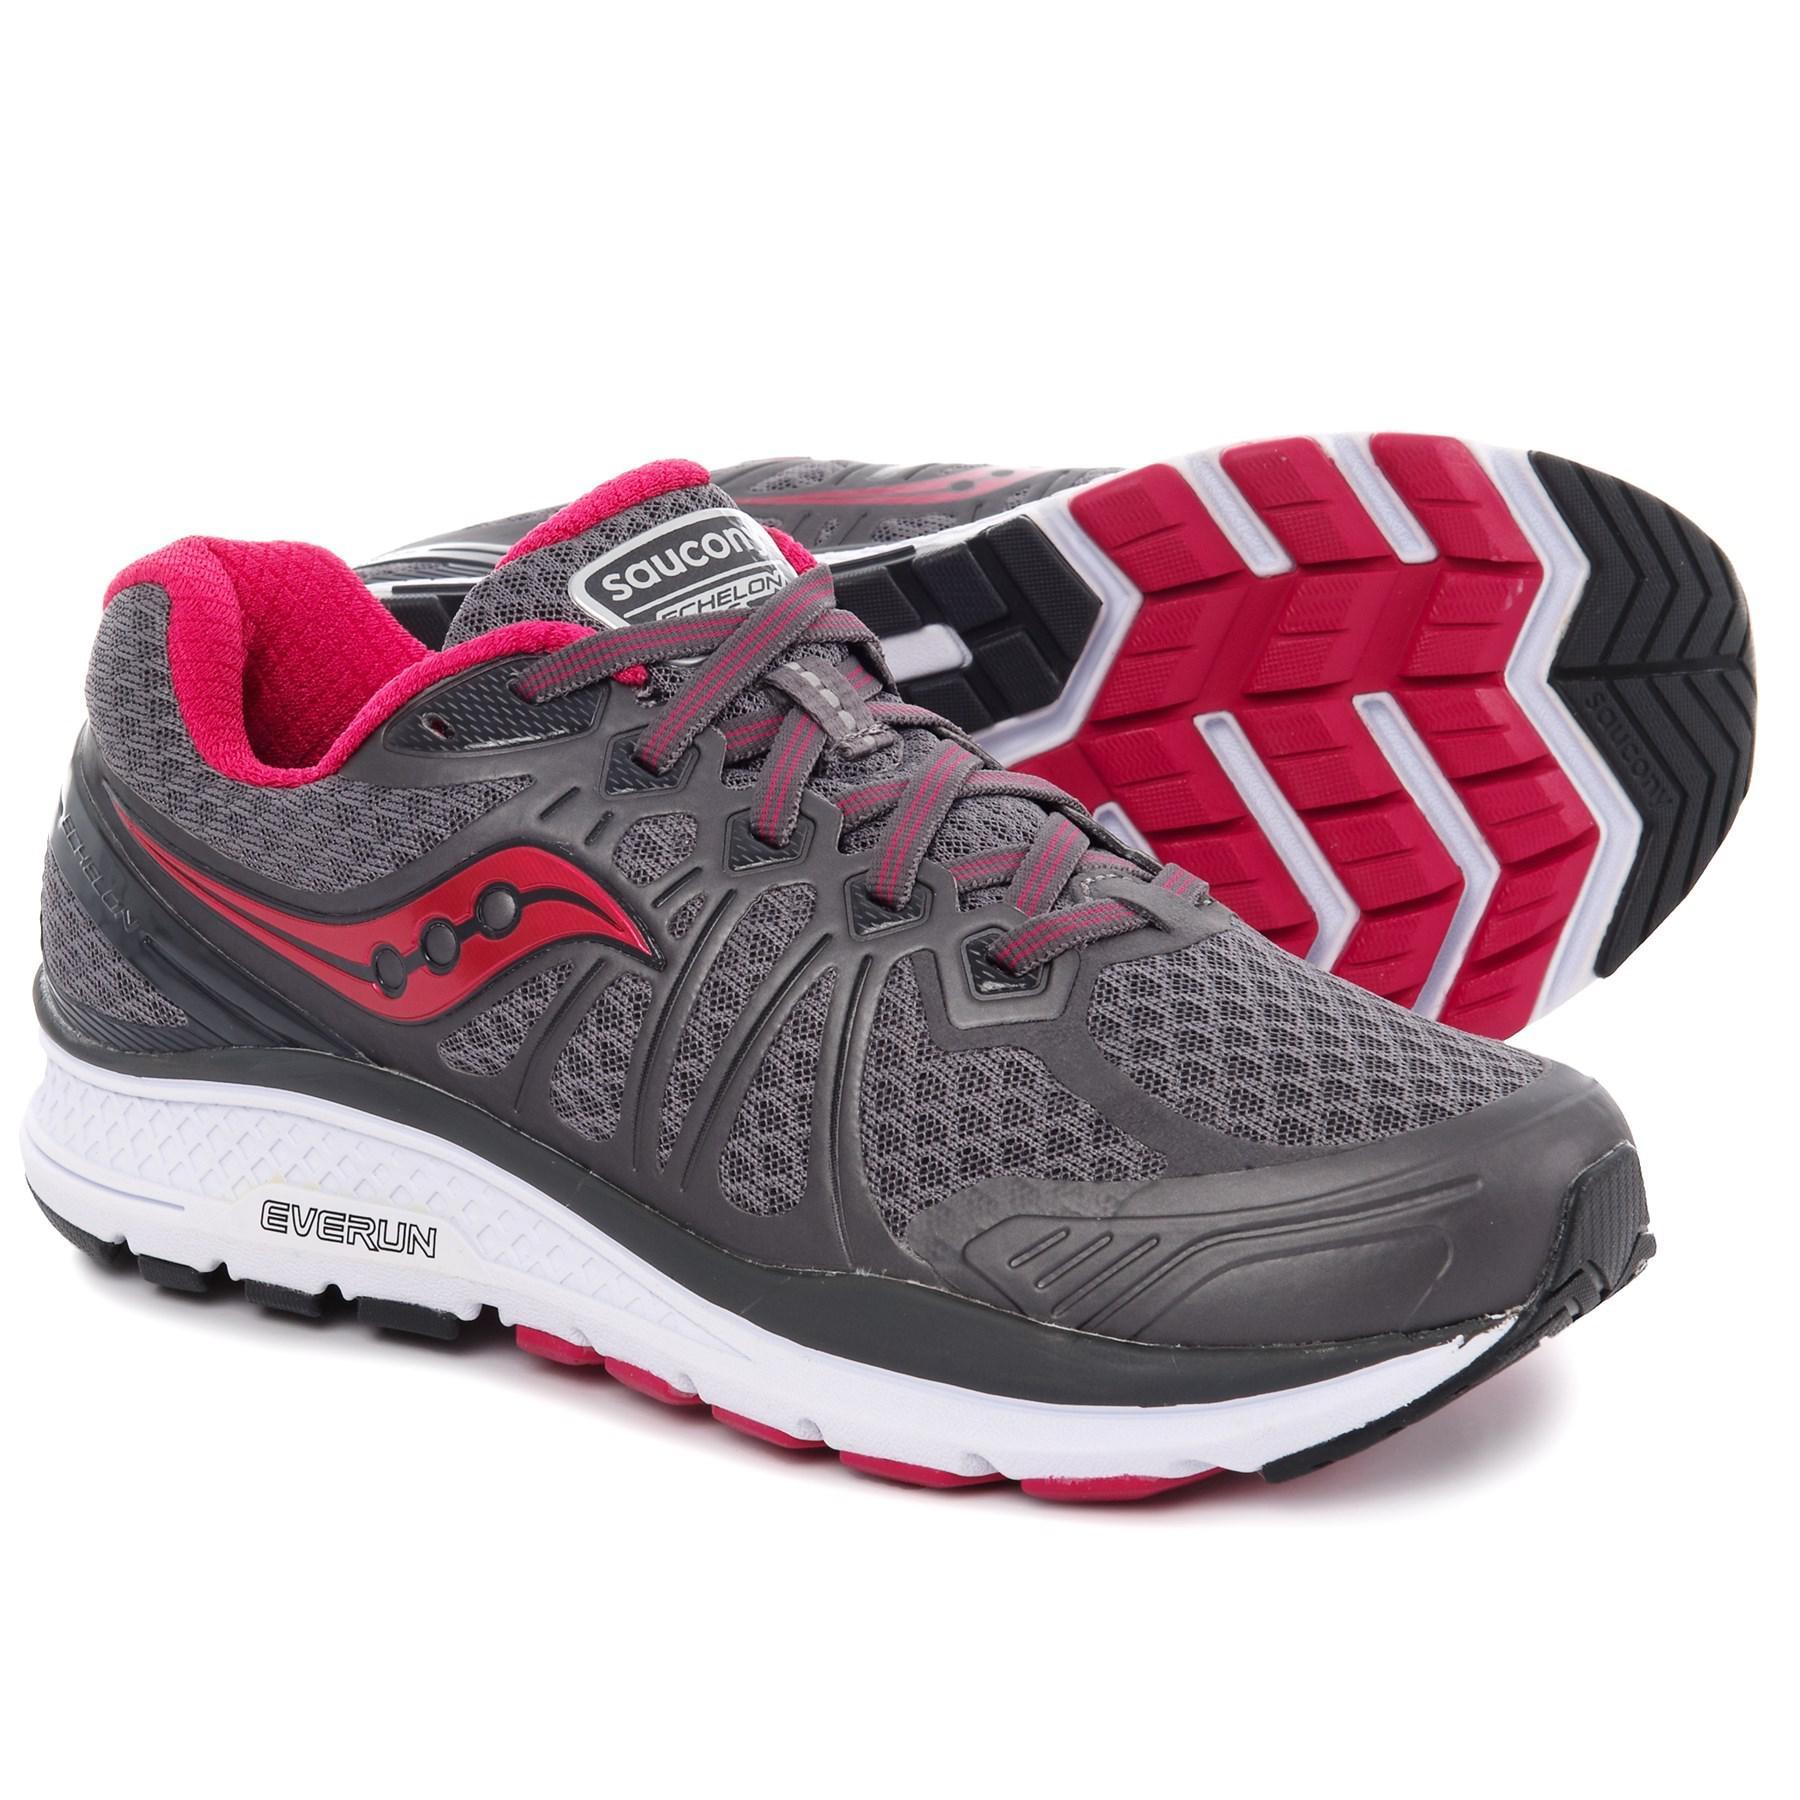 b56f568cbd4d Lyst - Saucony Echelon 6 (grey pink) Women s Running Shoes in Gray ...